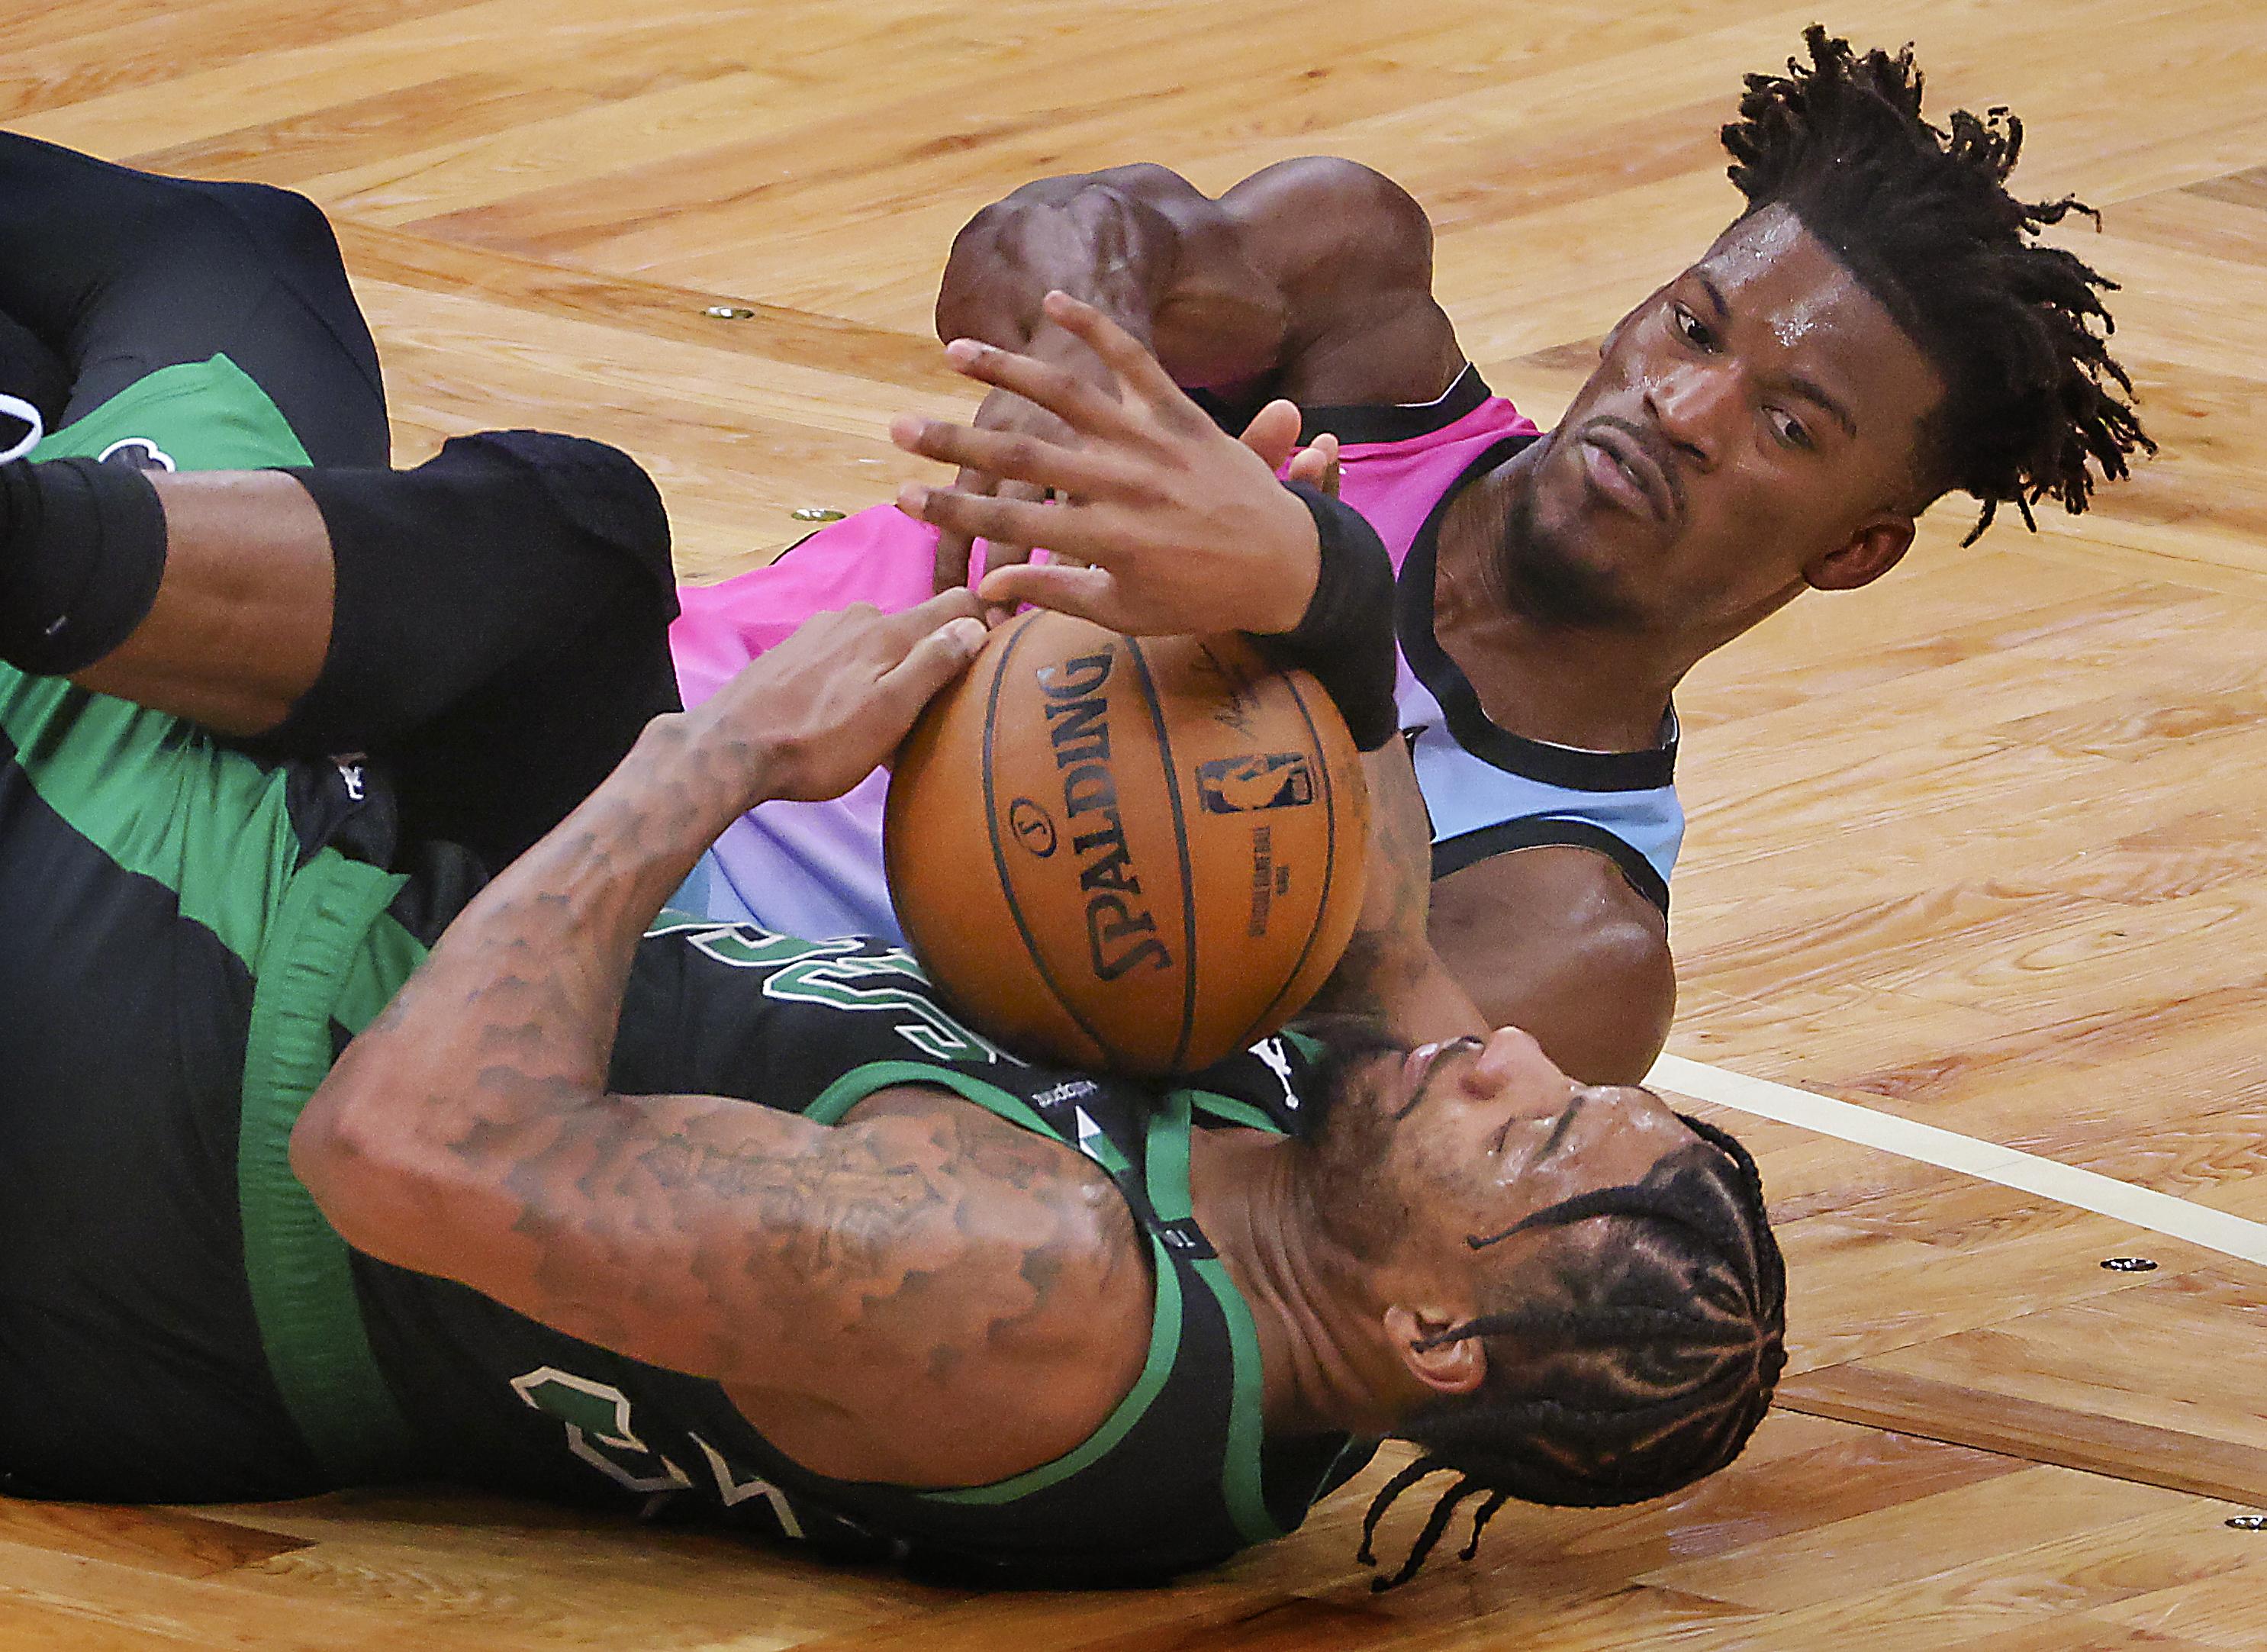 Miami Heat Vs Boston Celtics At TD Garden